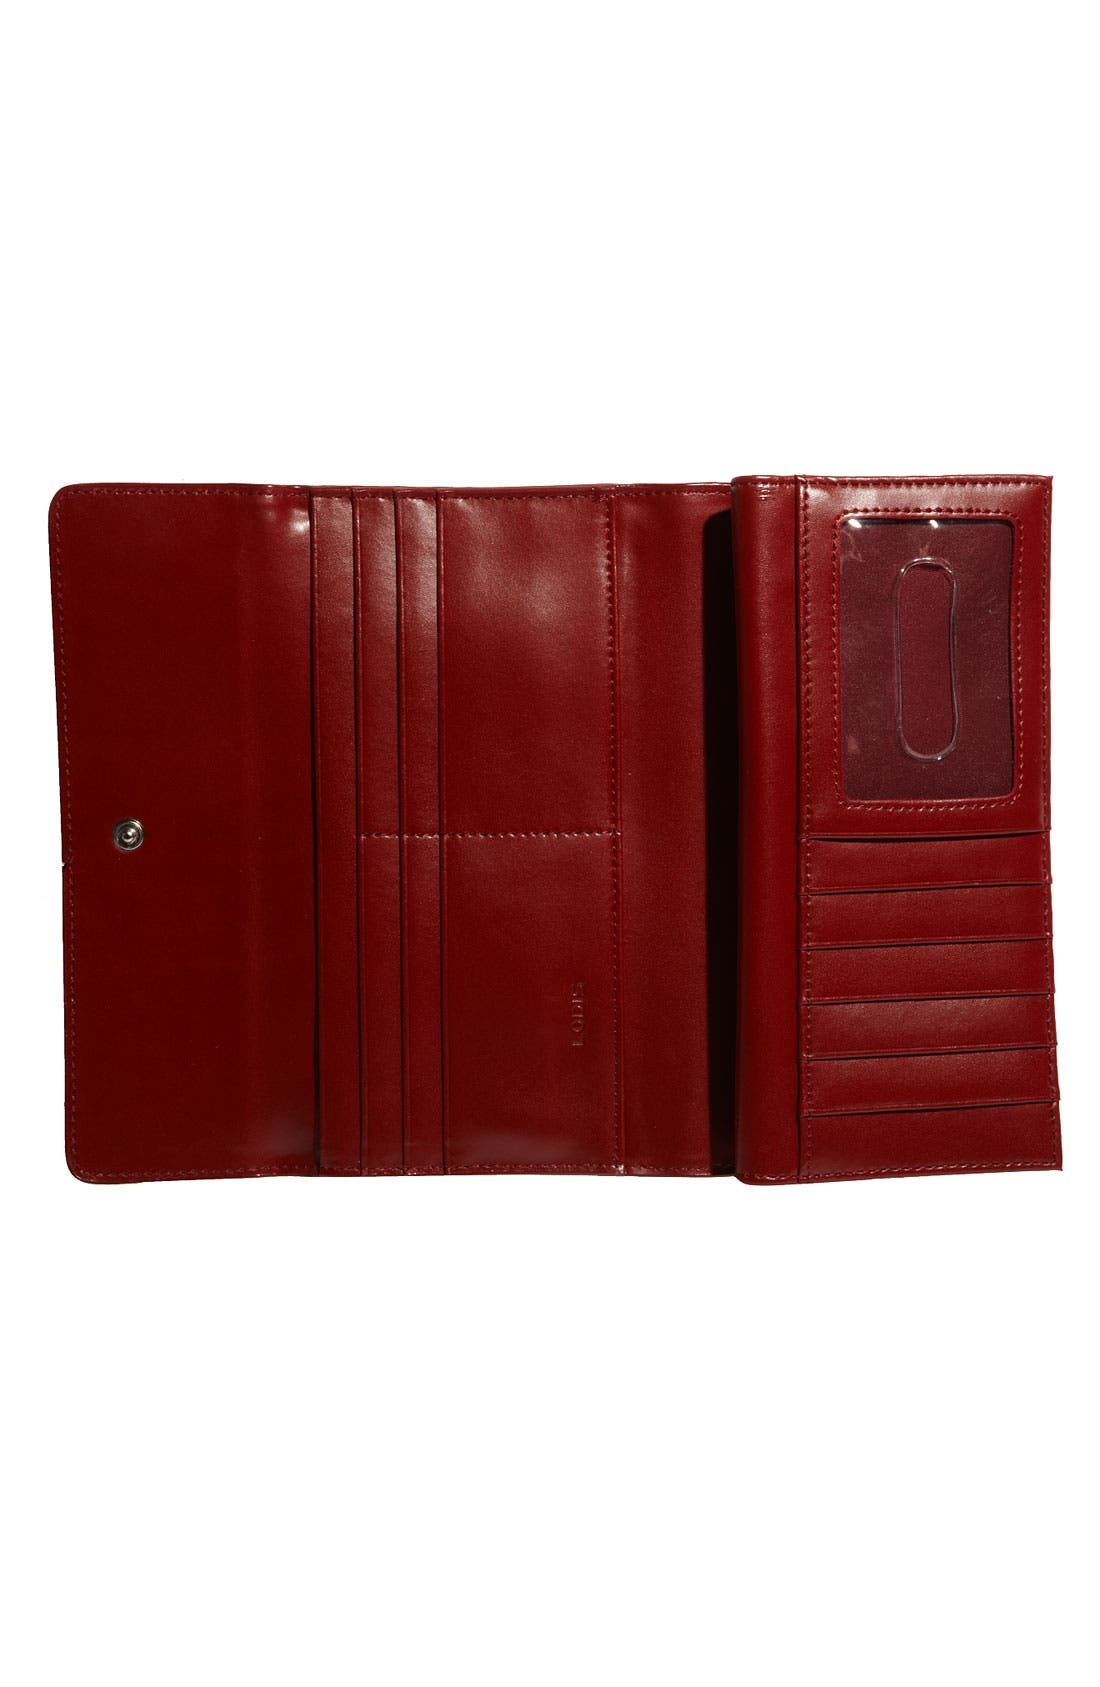 Lodis 'Audrey' Checkbook Clutch Wallet,                             Alternate thumbnail 3, color,                             Teal/ Merlot